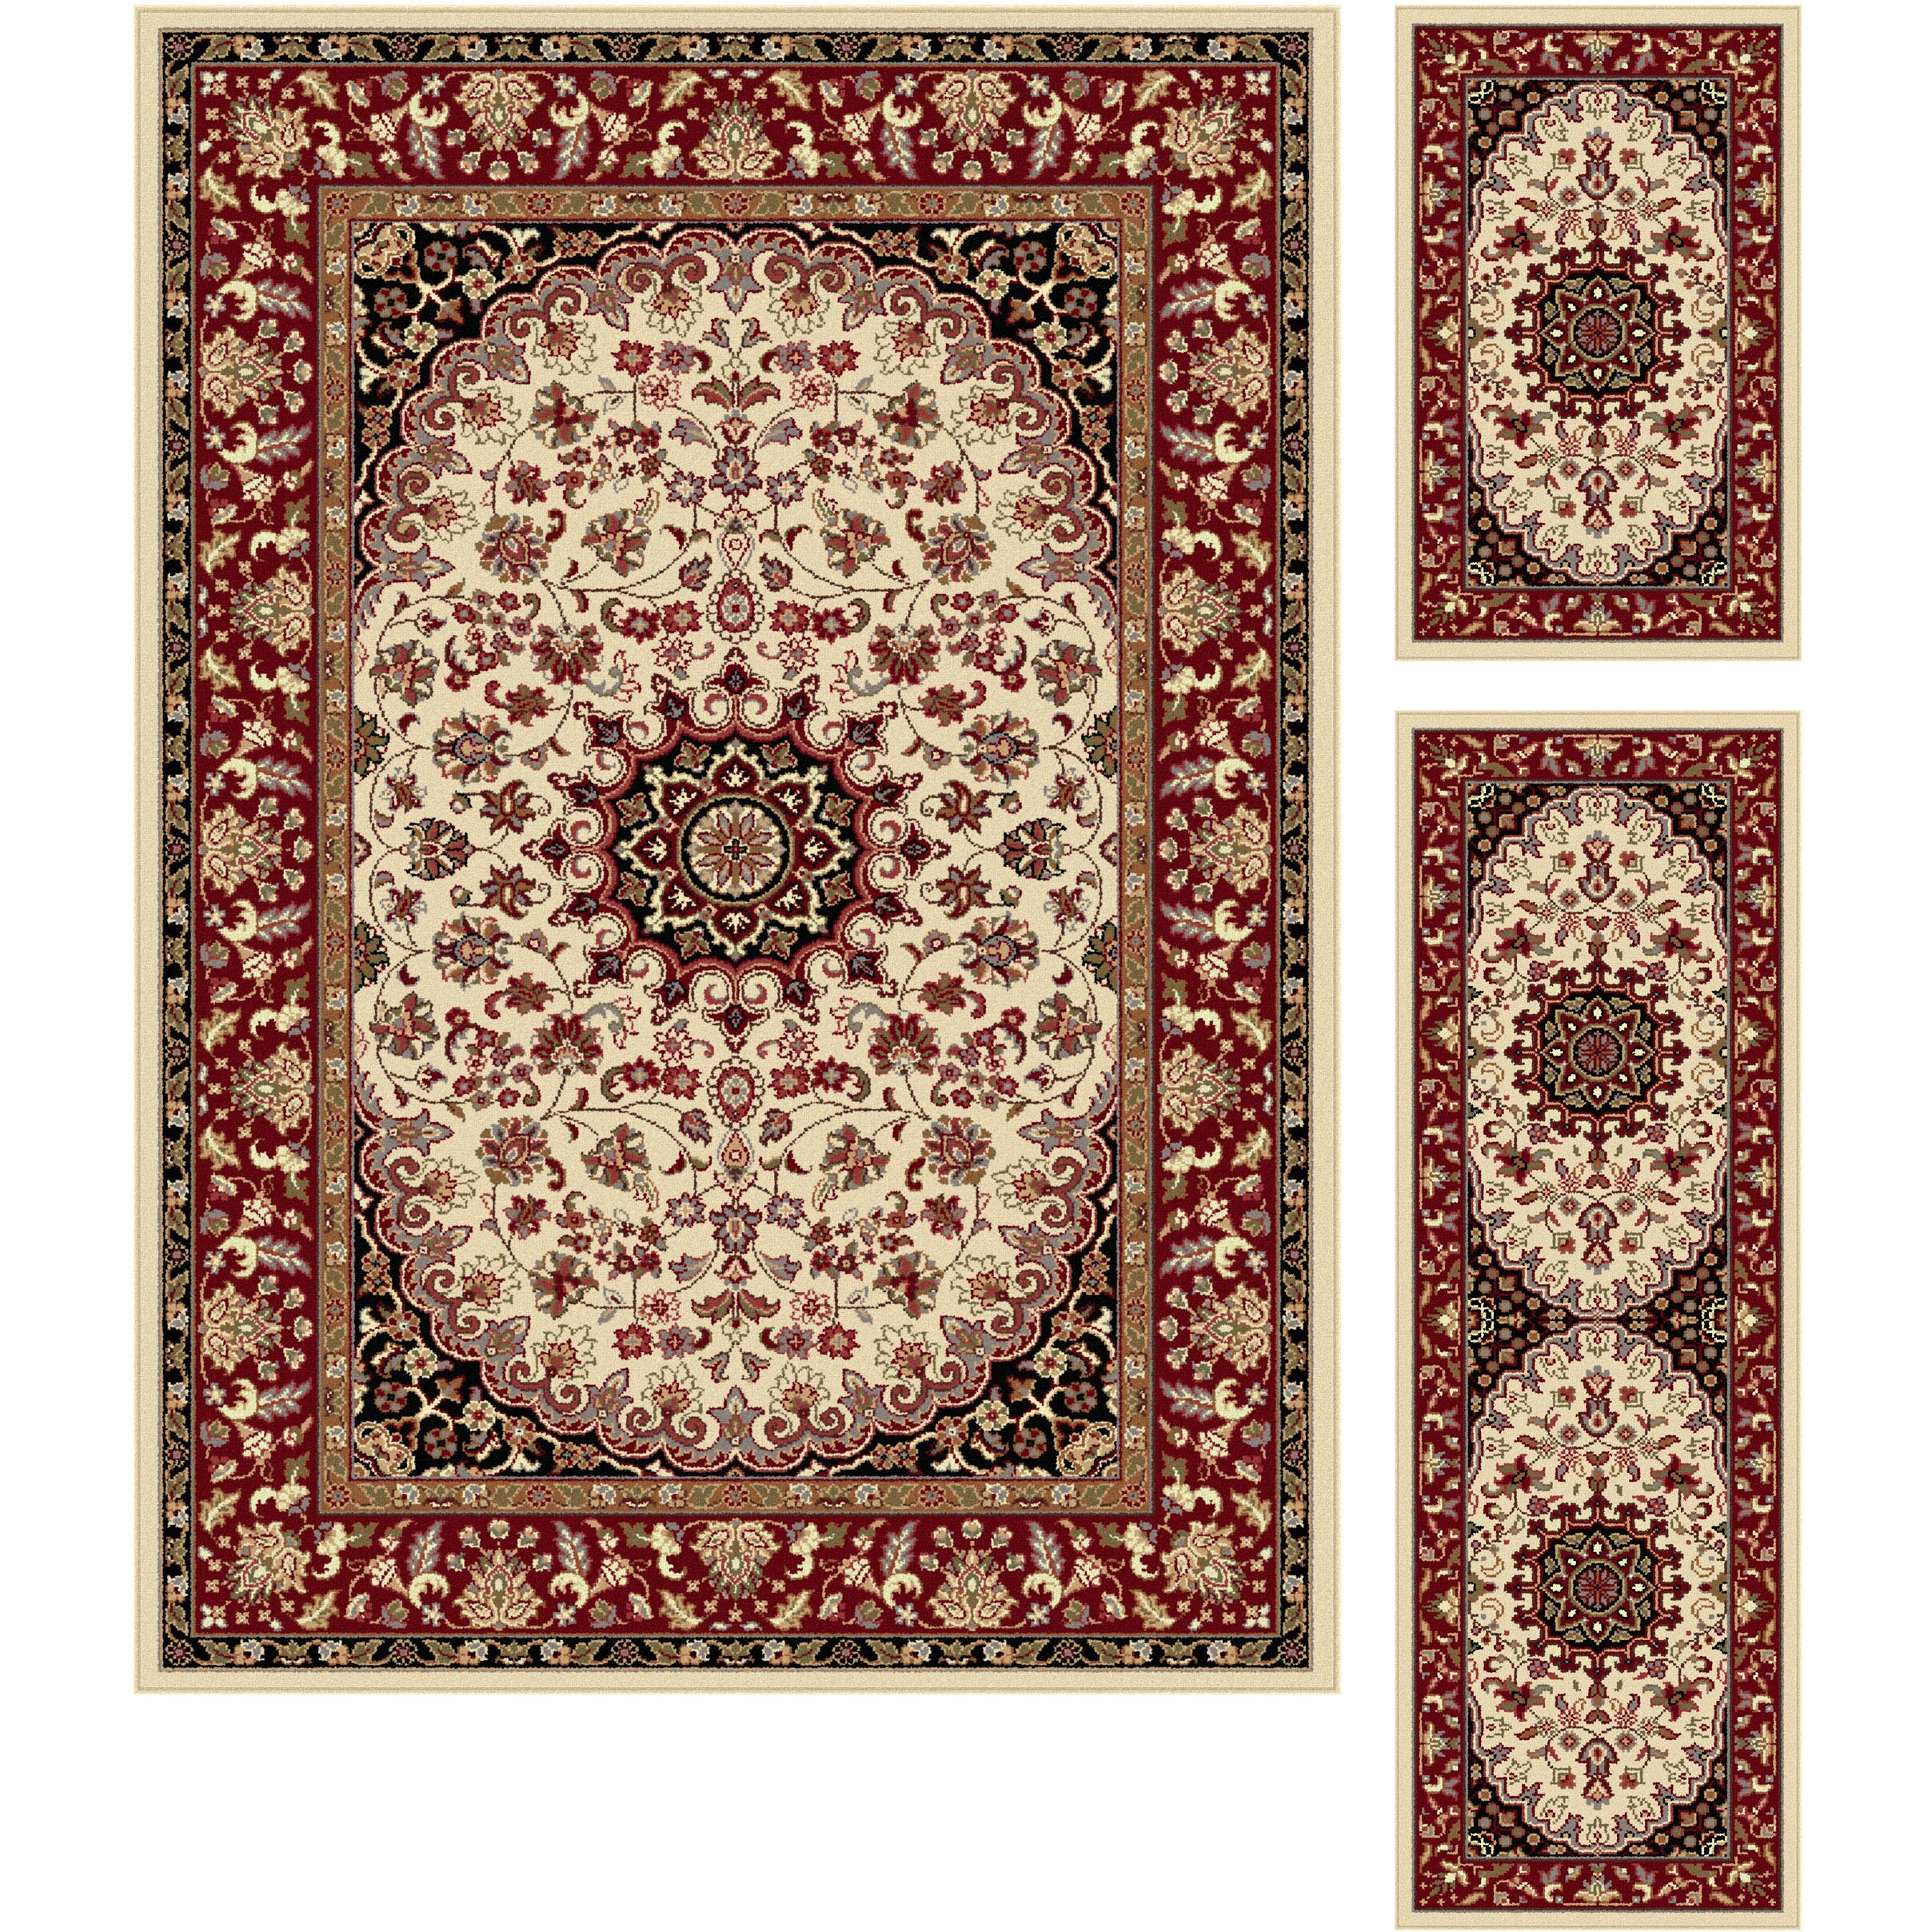 Threadbind litchford beige red 3 piece area rug set wayfair for Area rug sets